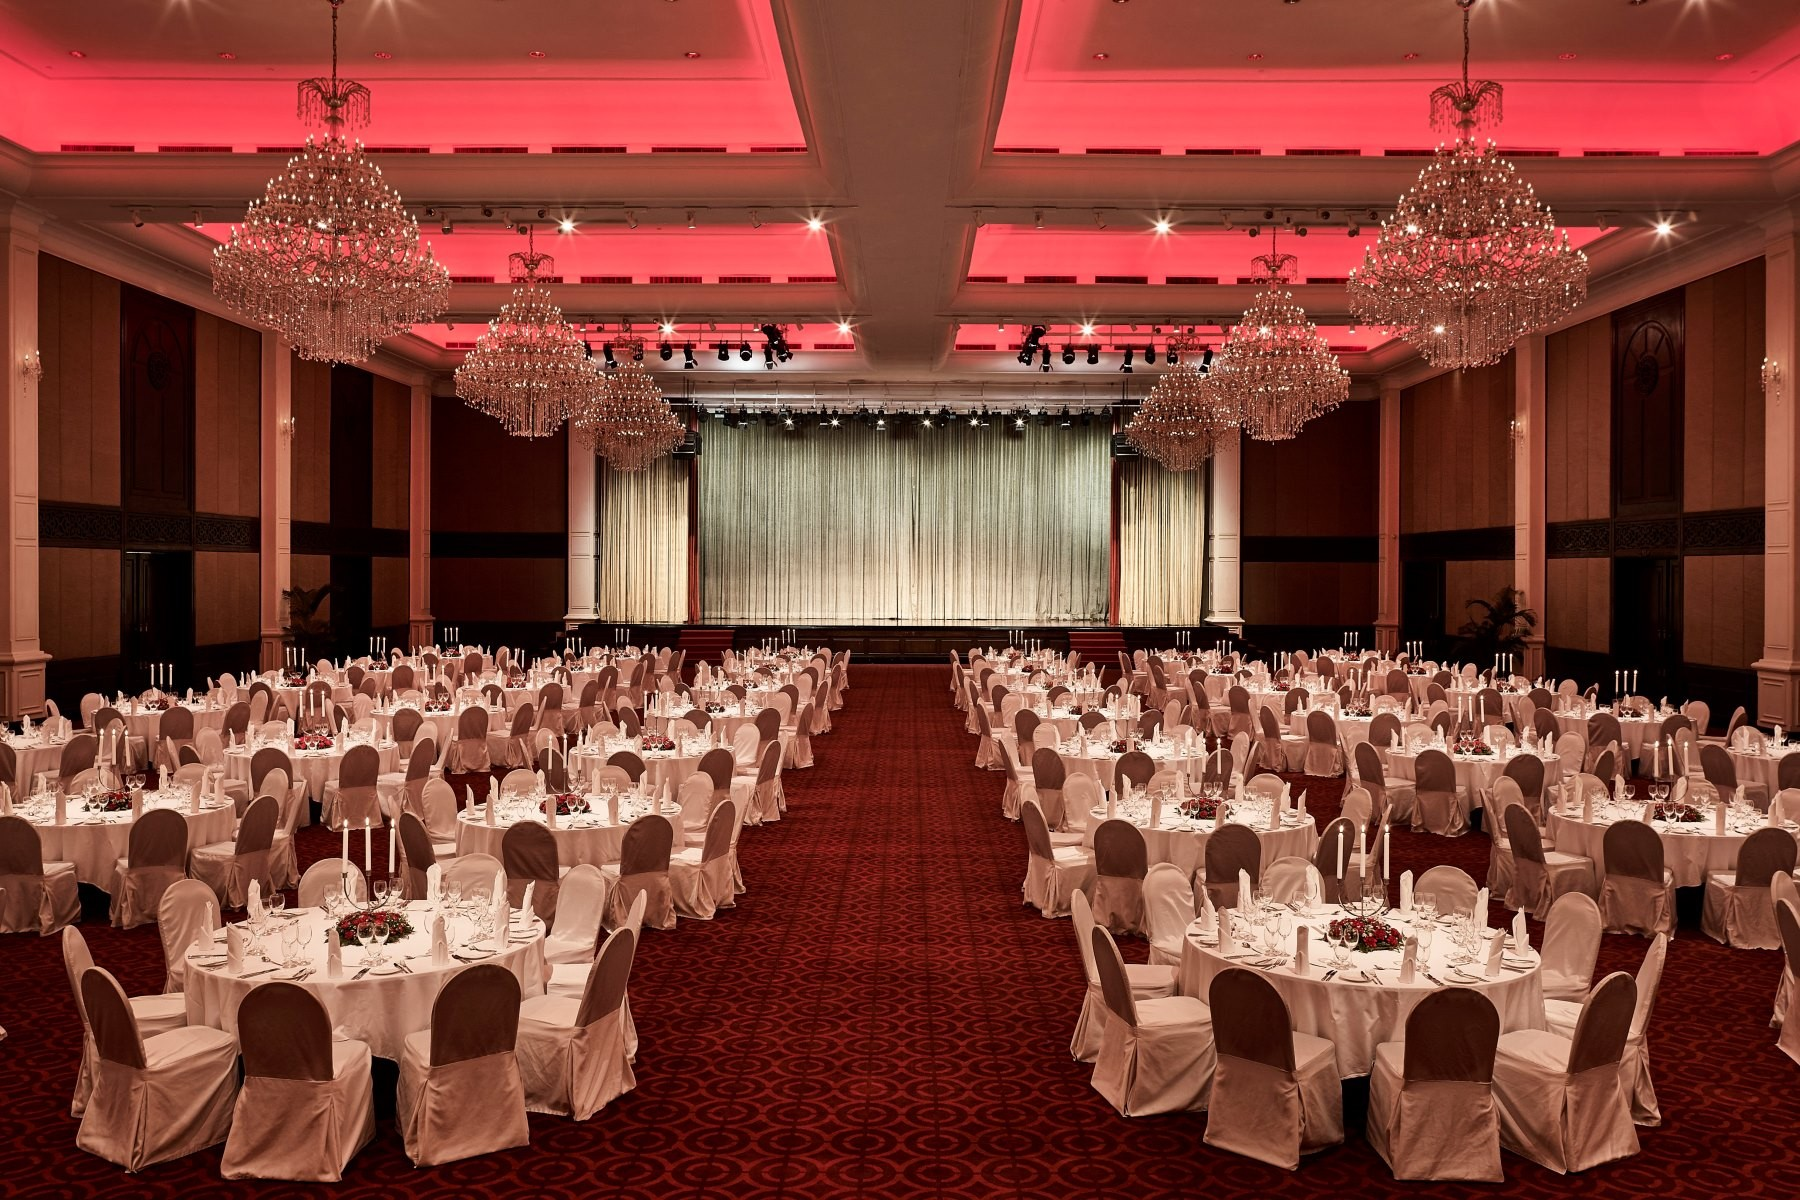 sofitel-phnompenh-phokeethra-events-ballroom.jpg